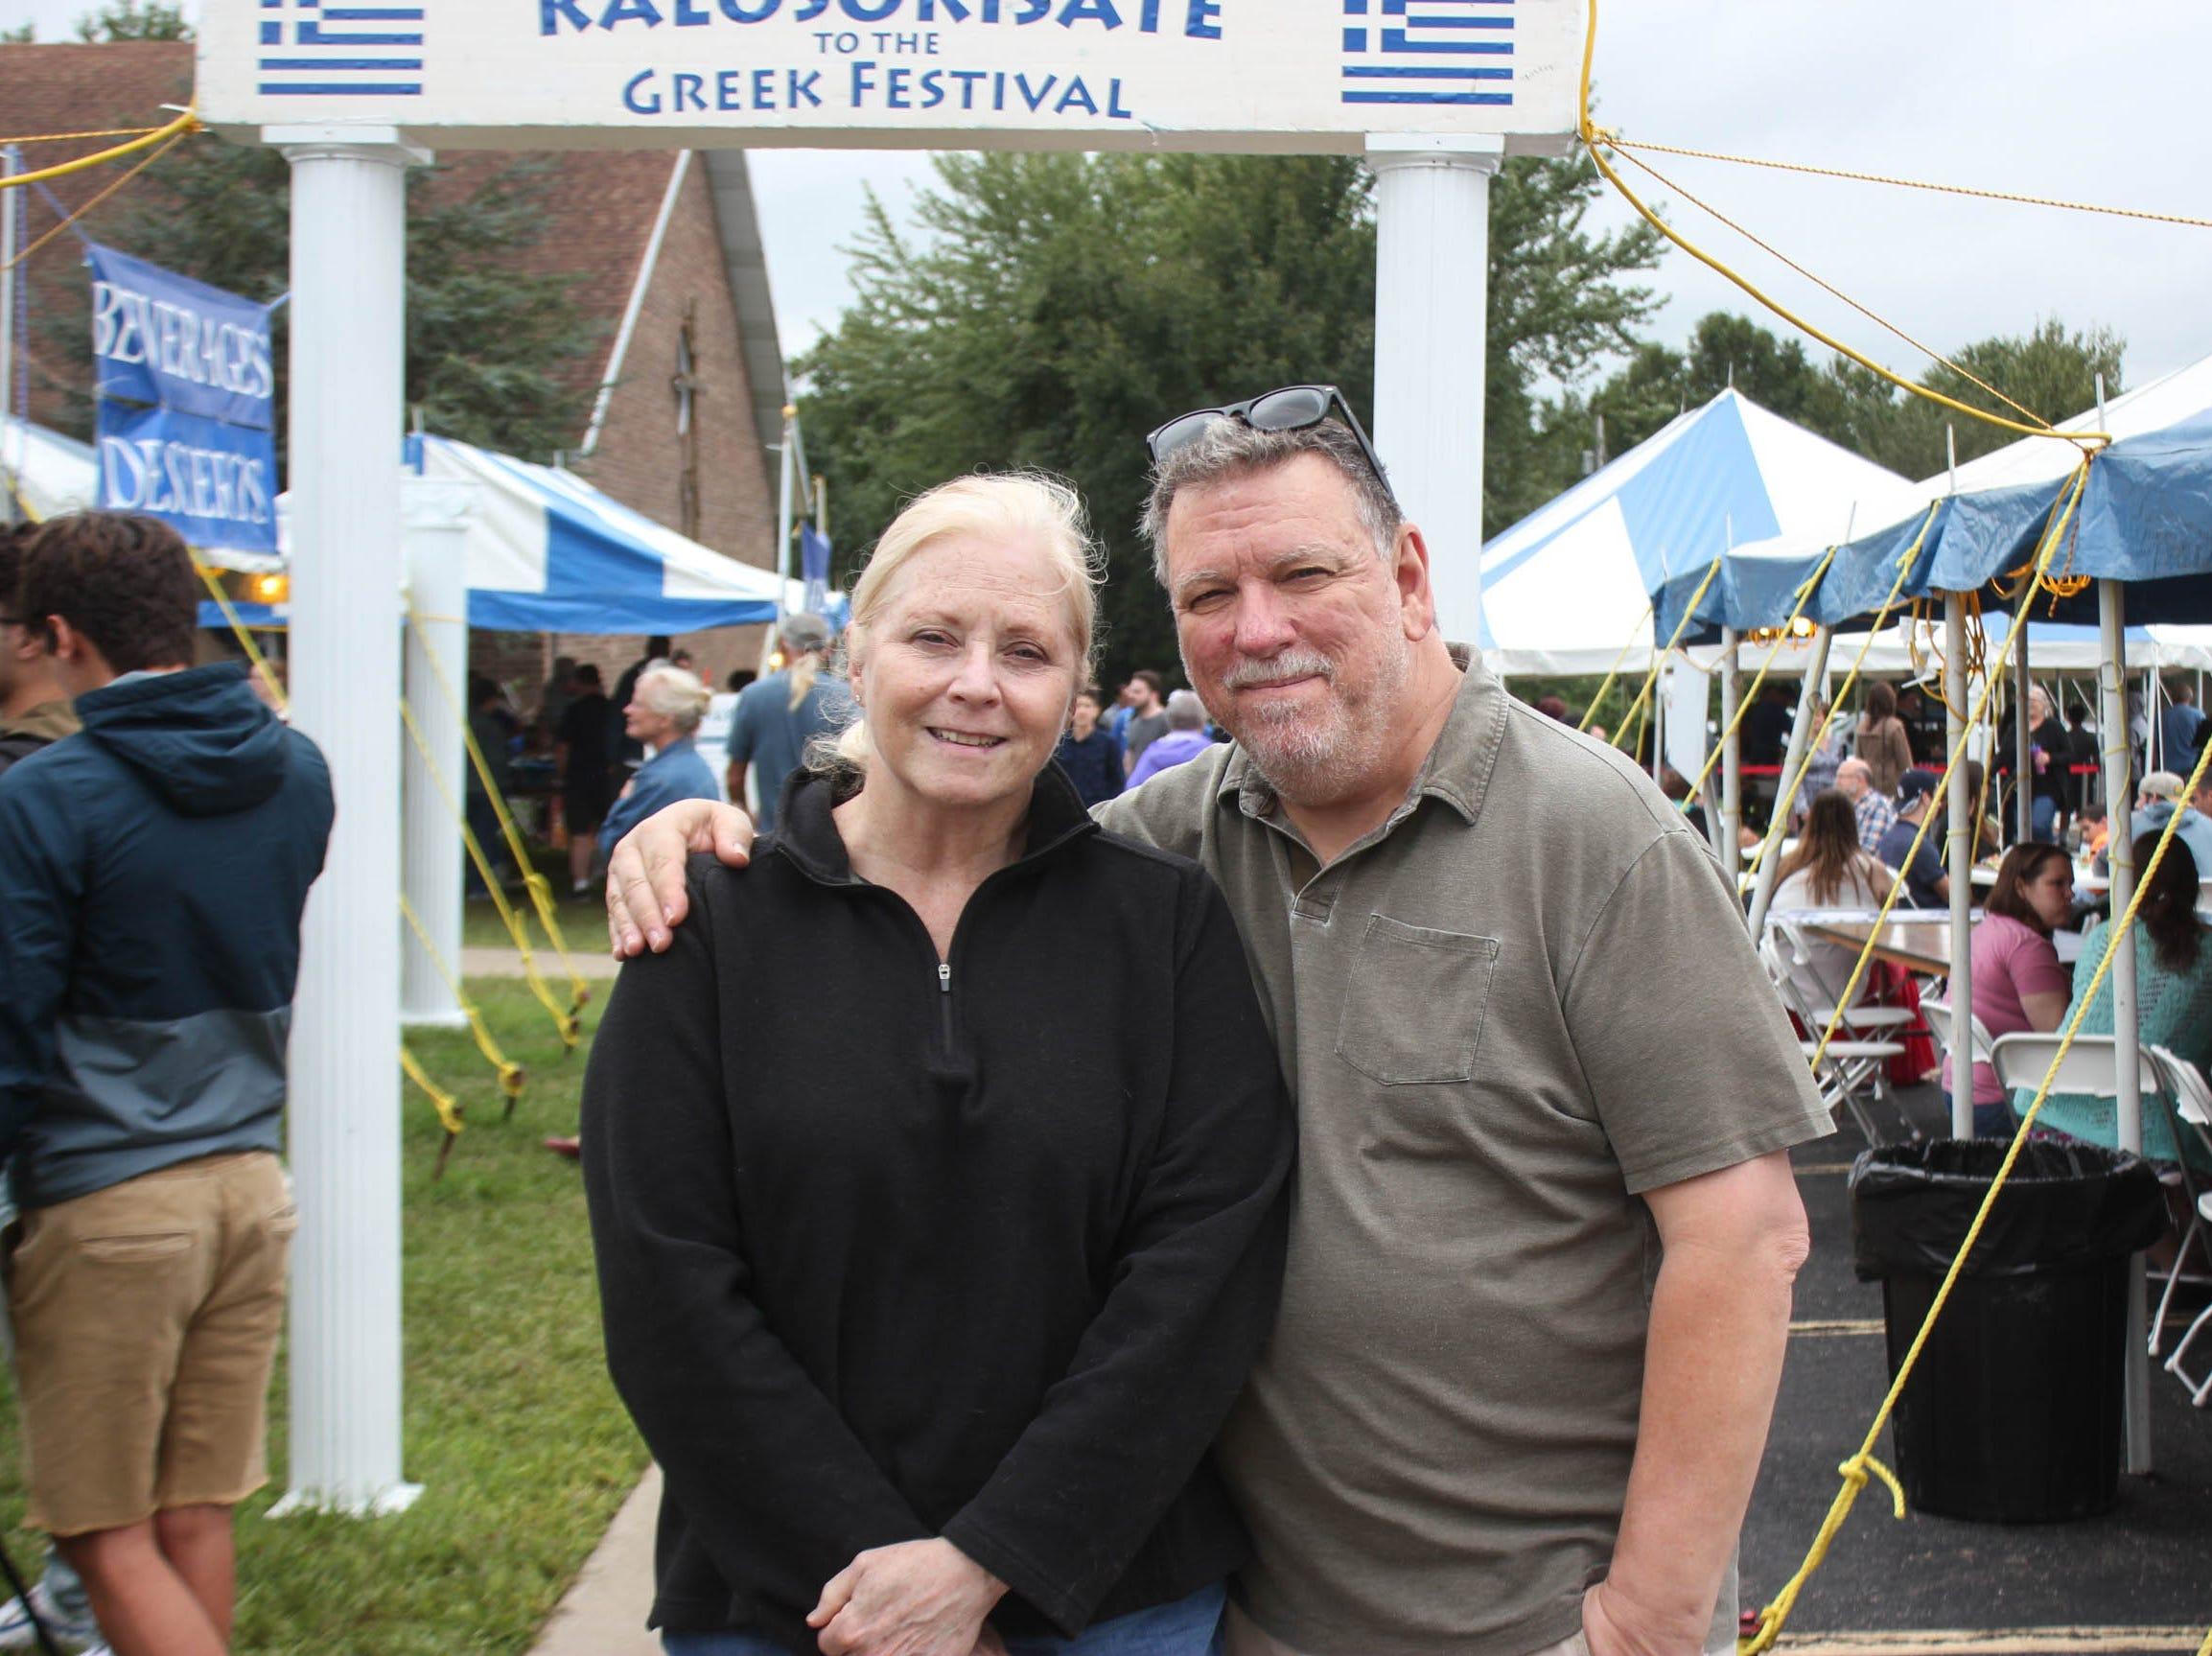 Karen Matoon and Rick Matoon